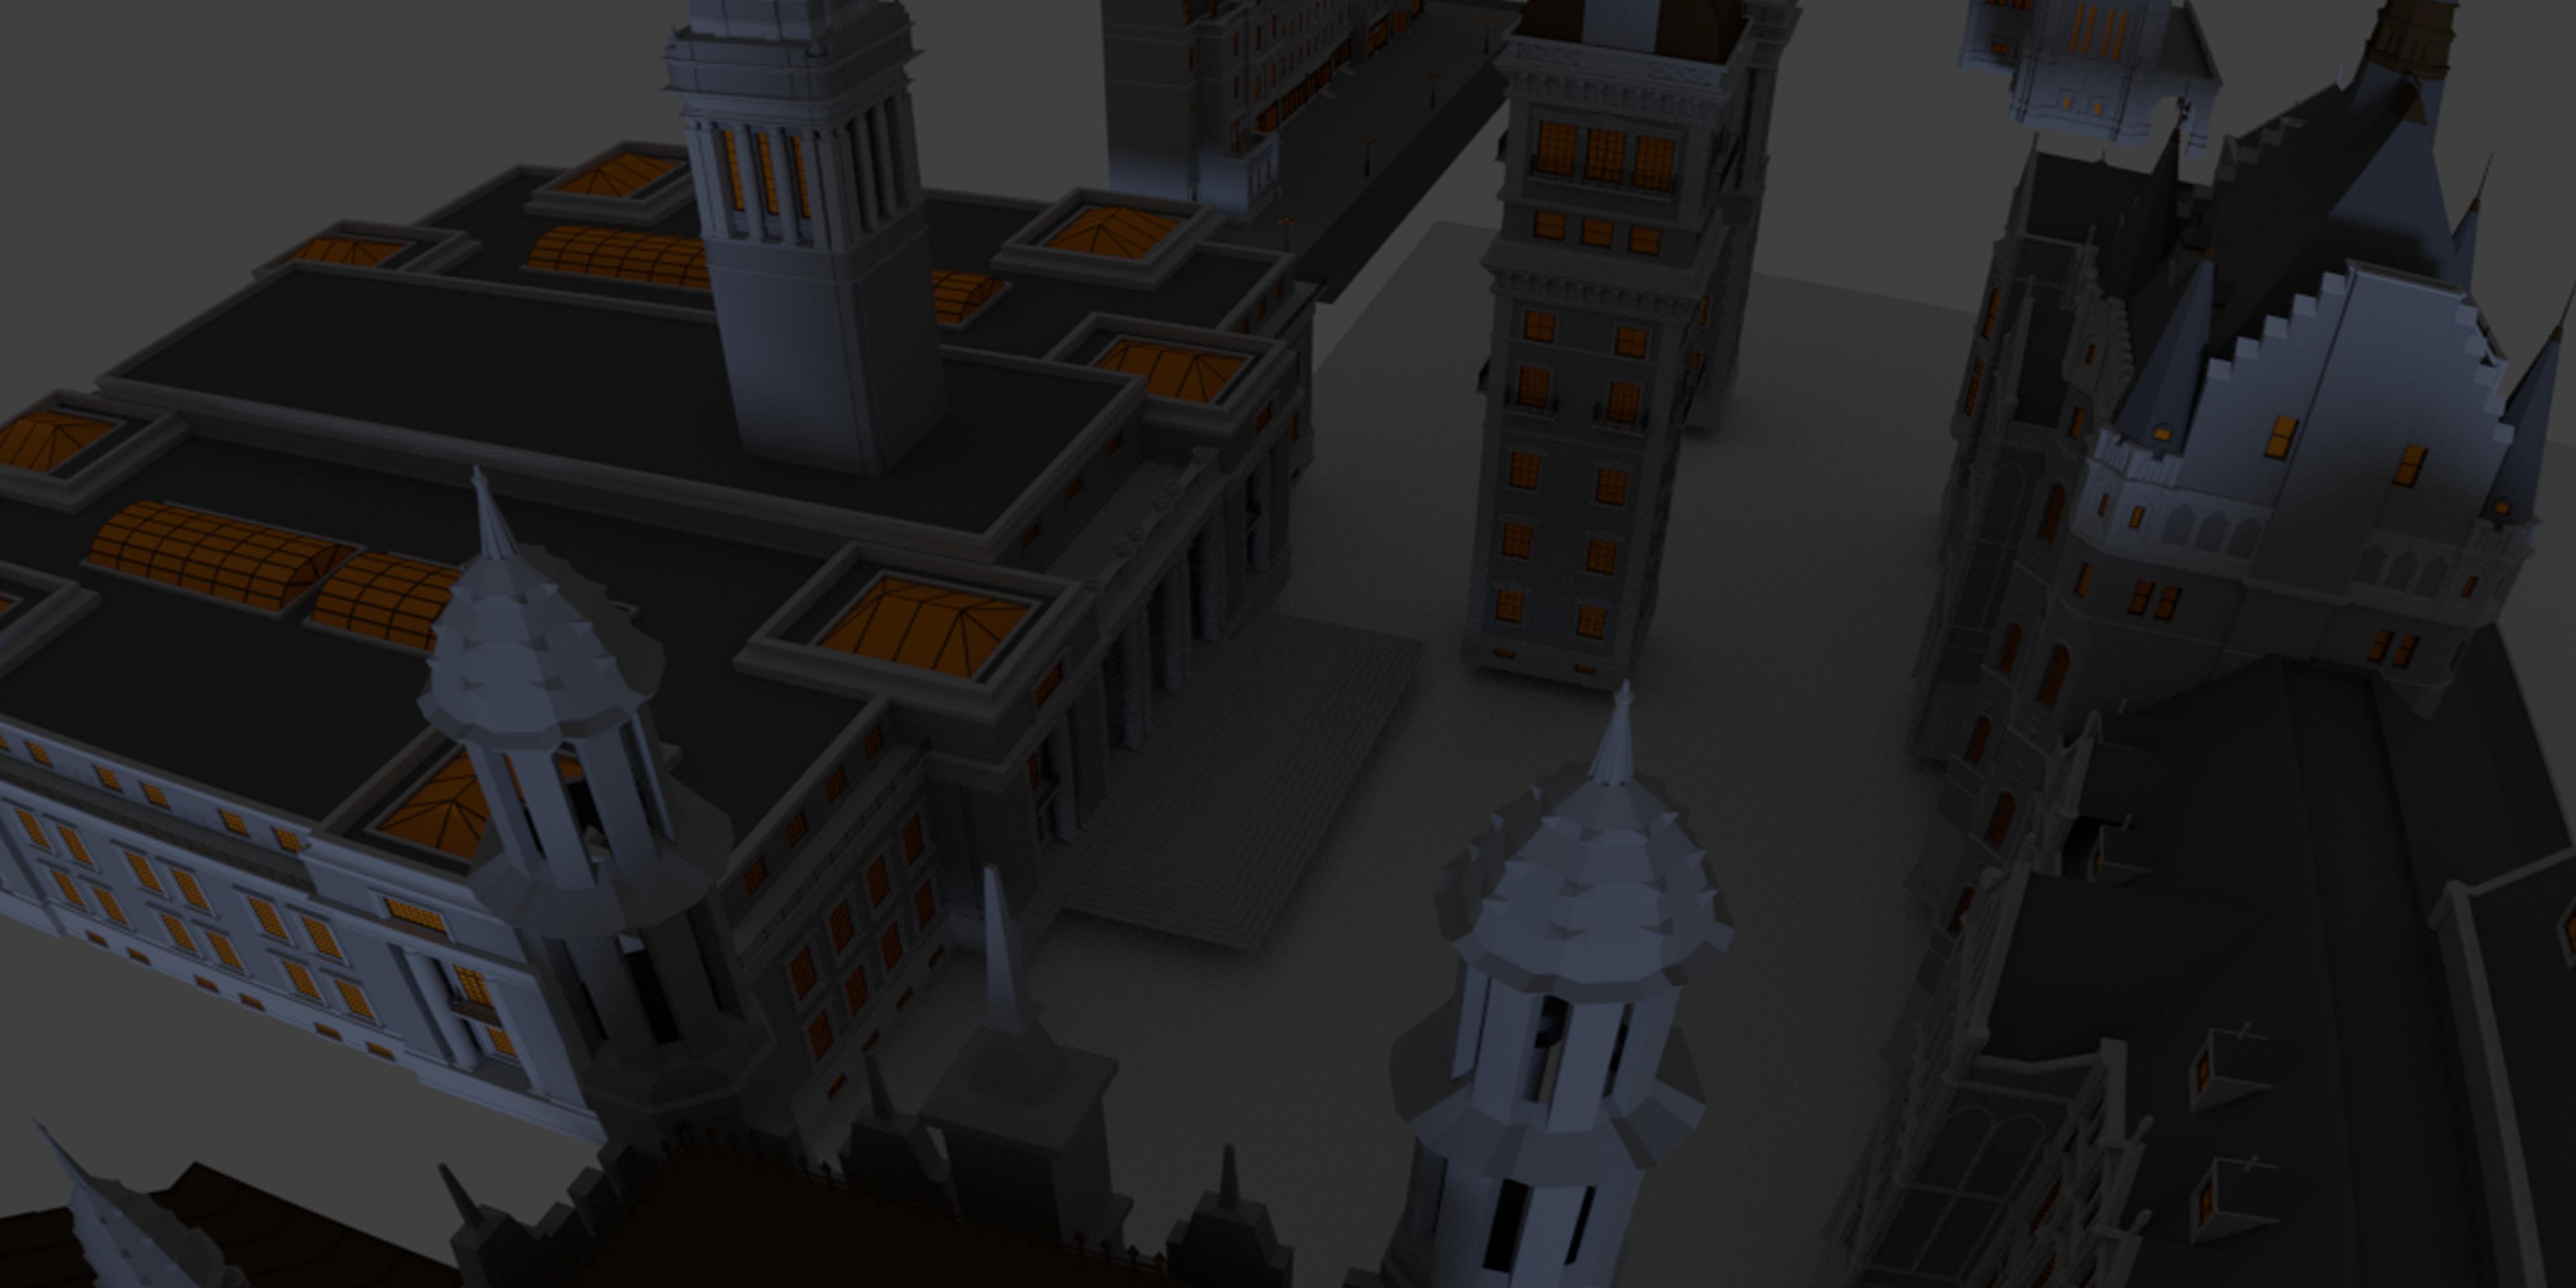 3D models I organised and lit in Blender.